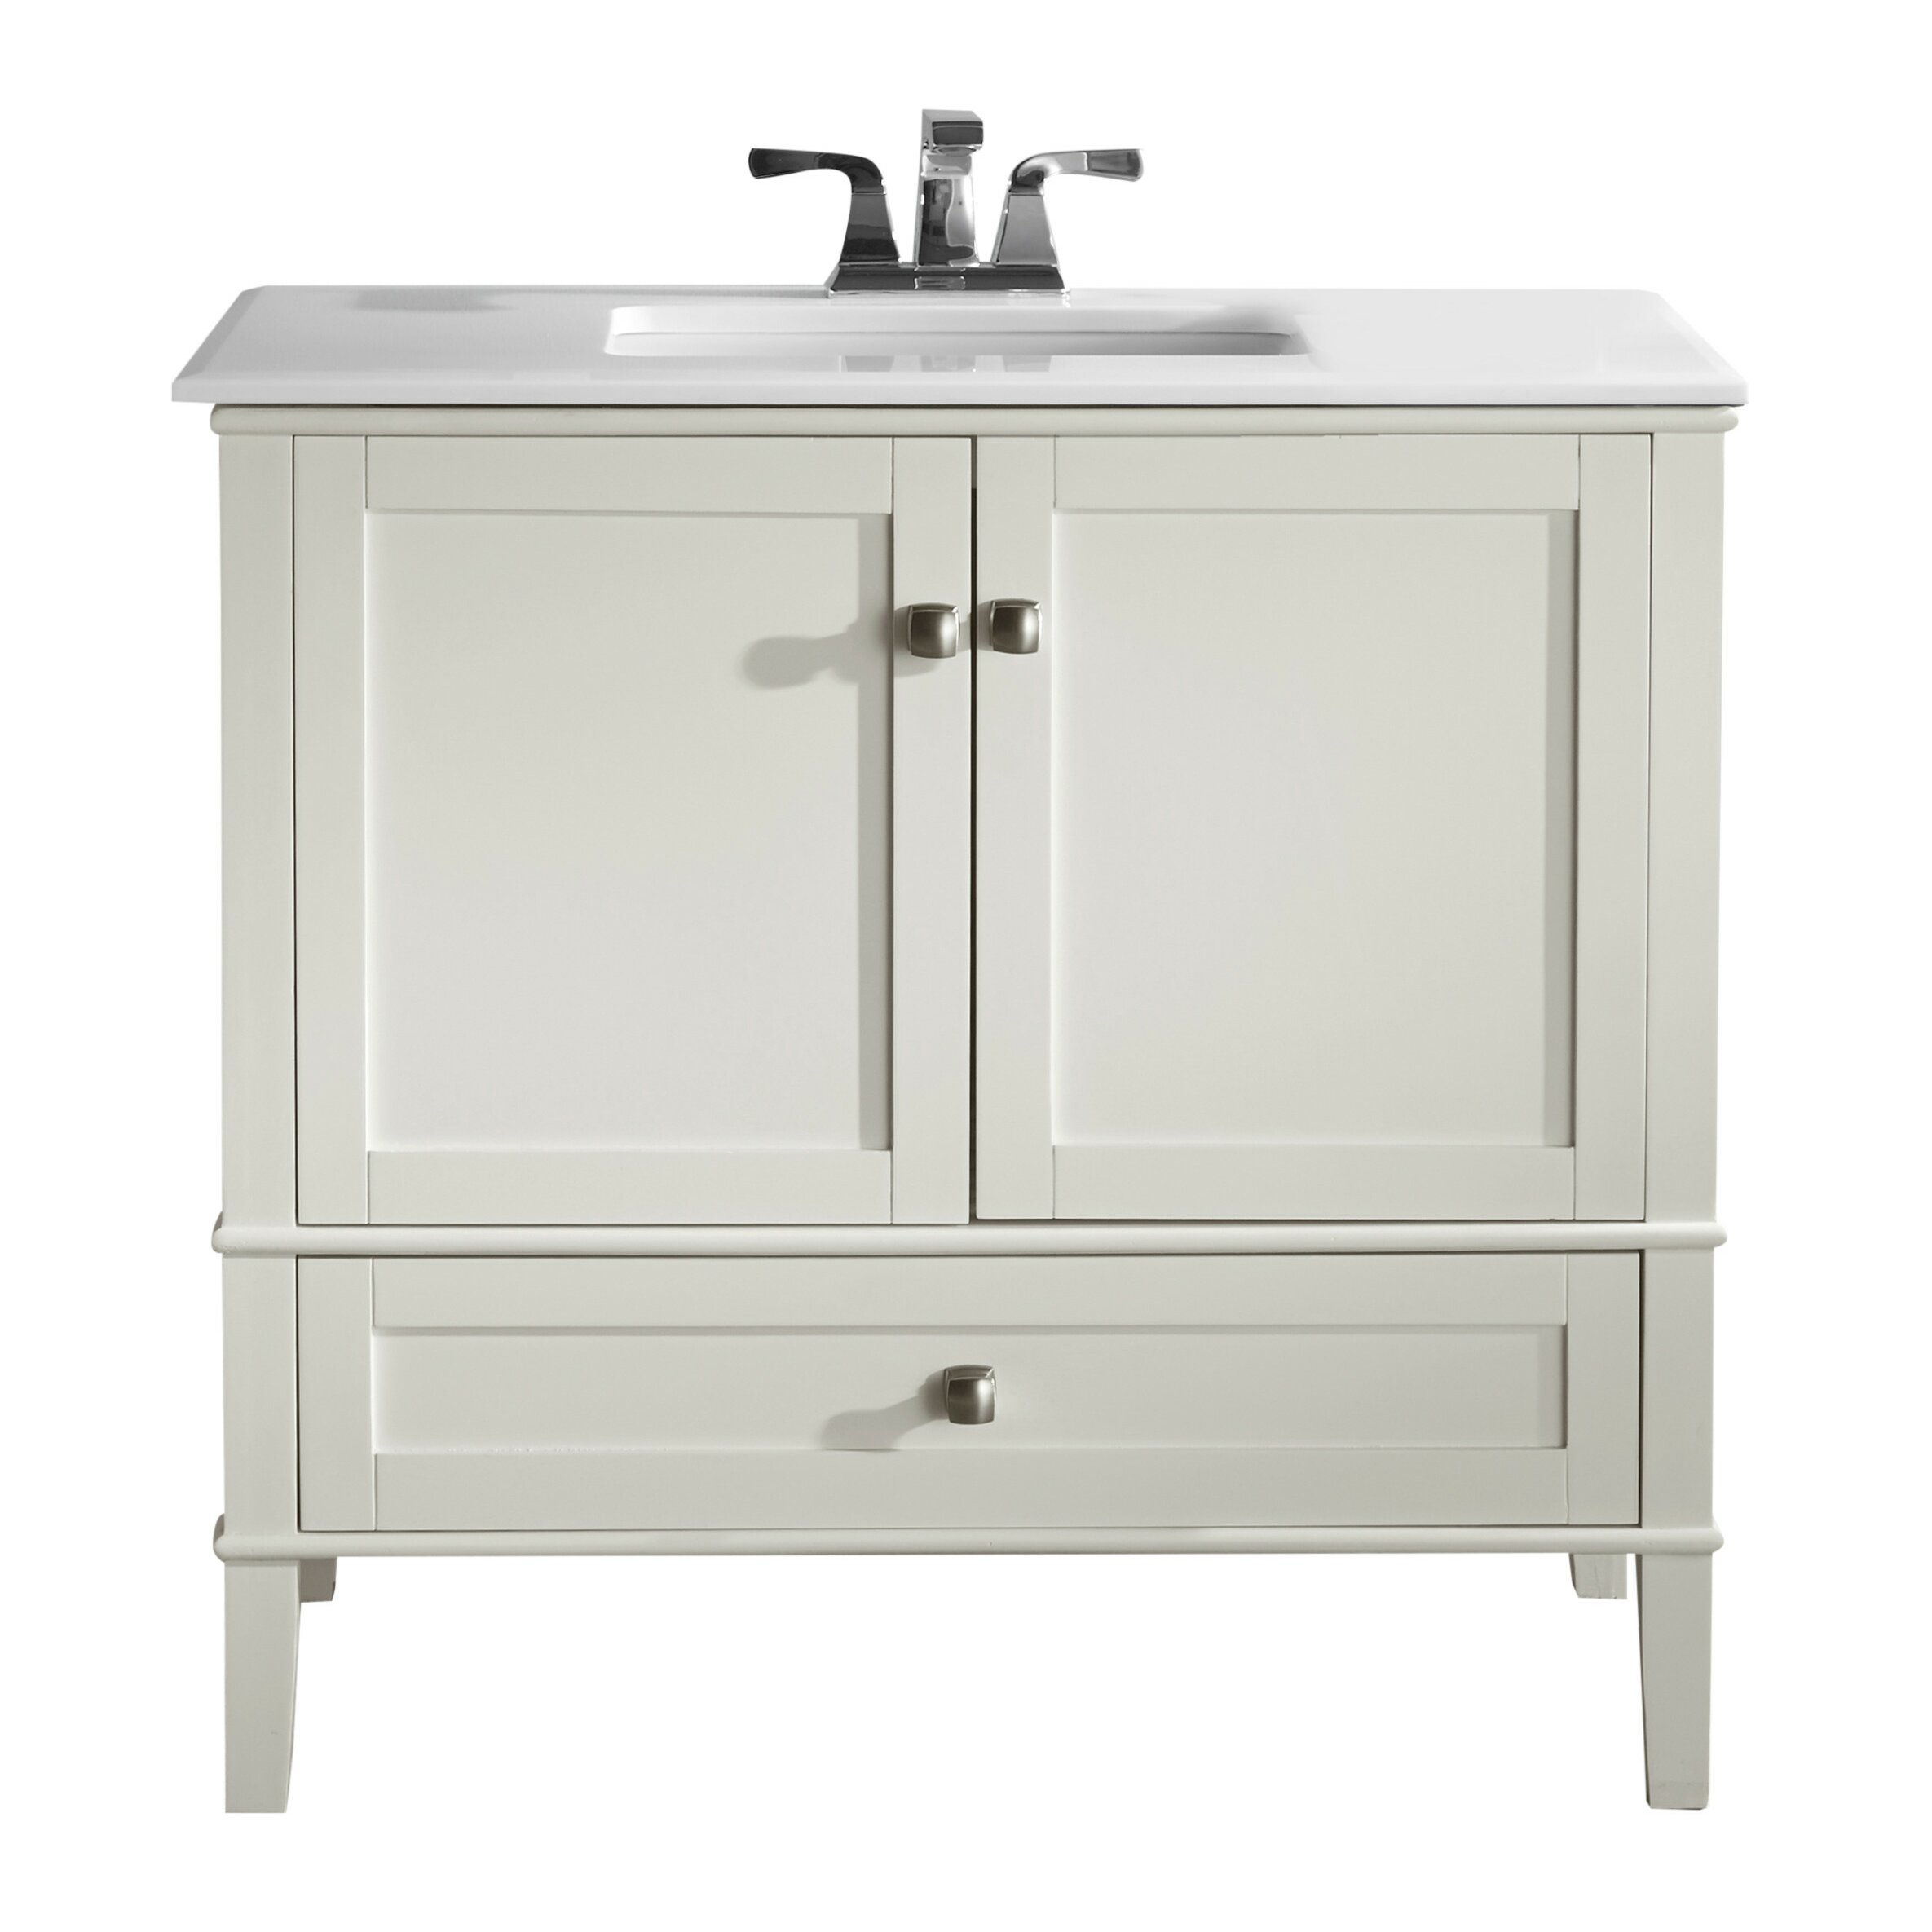 "simpli home chelsea "" single bathroom vanity set  reviews  wayfair, Bathroom decor"